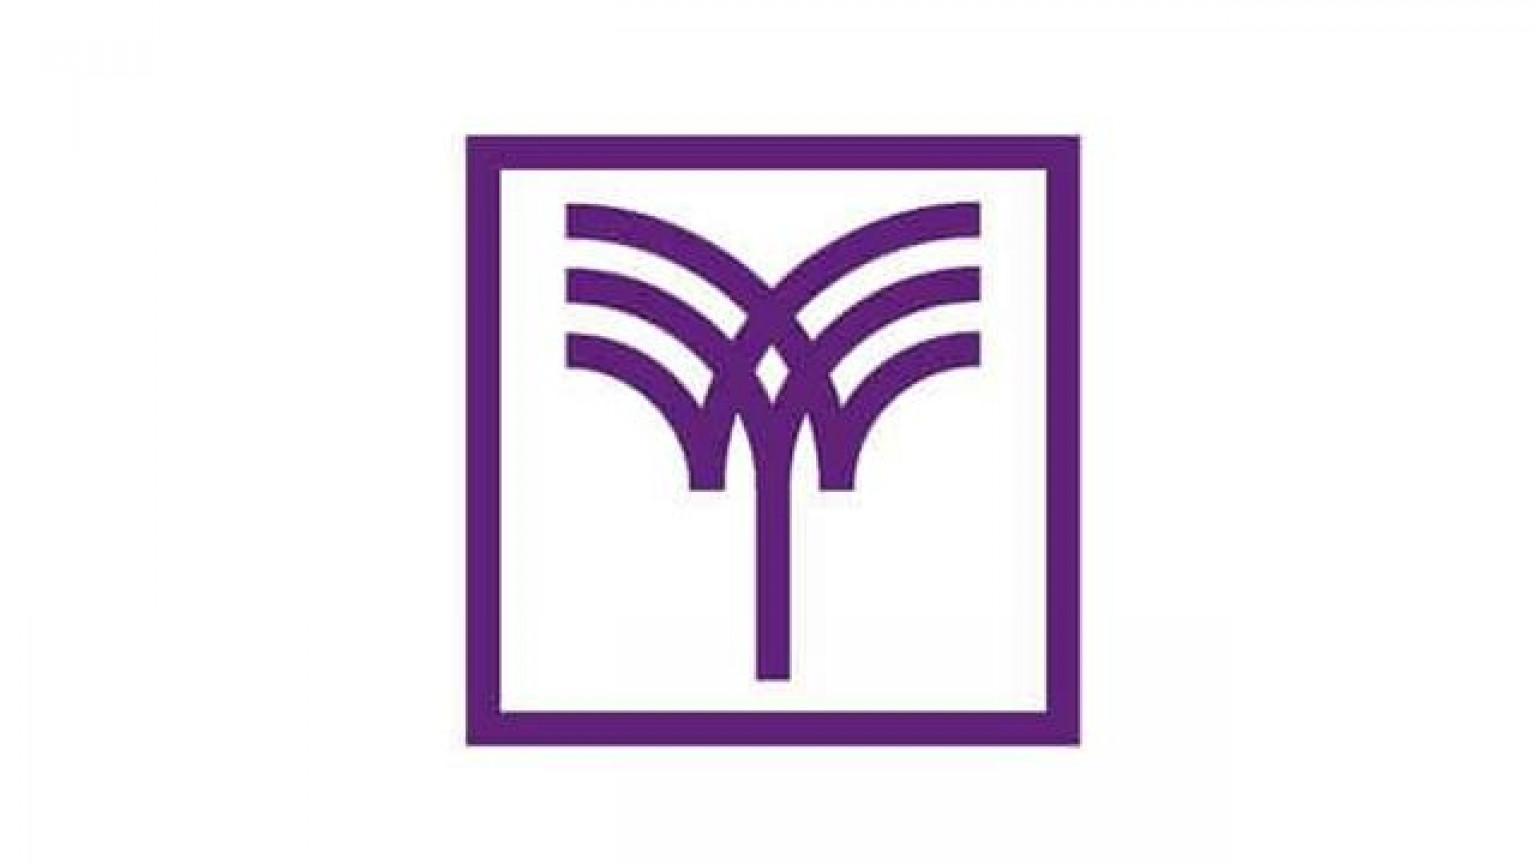 Logo of Peer-to-Peer Property lending platform Assetz Capital